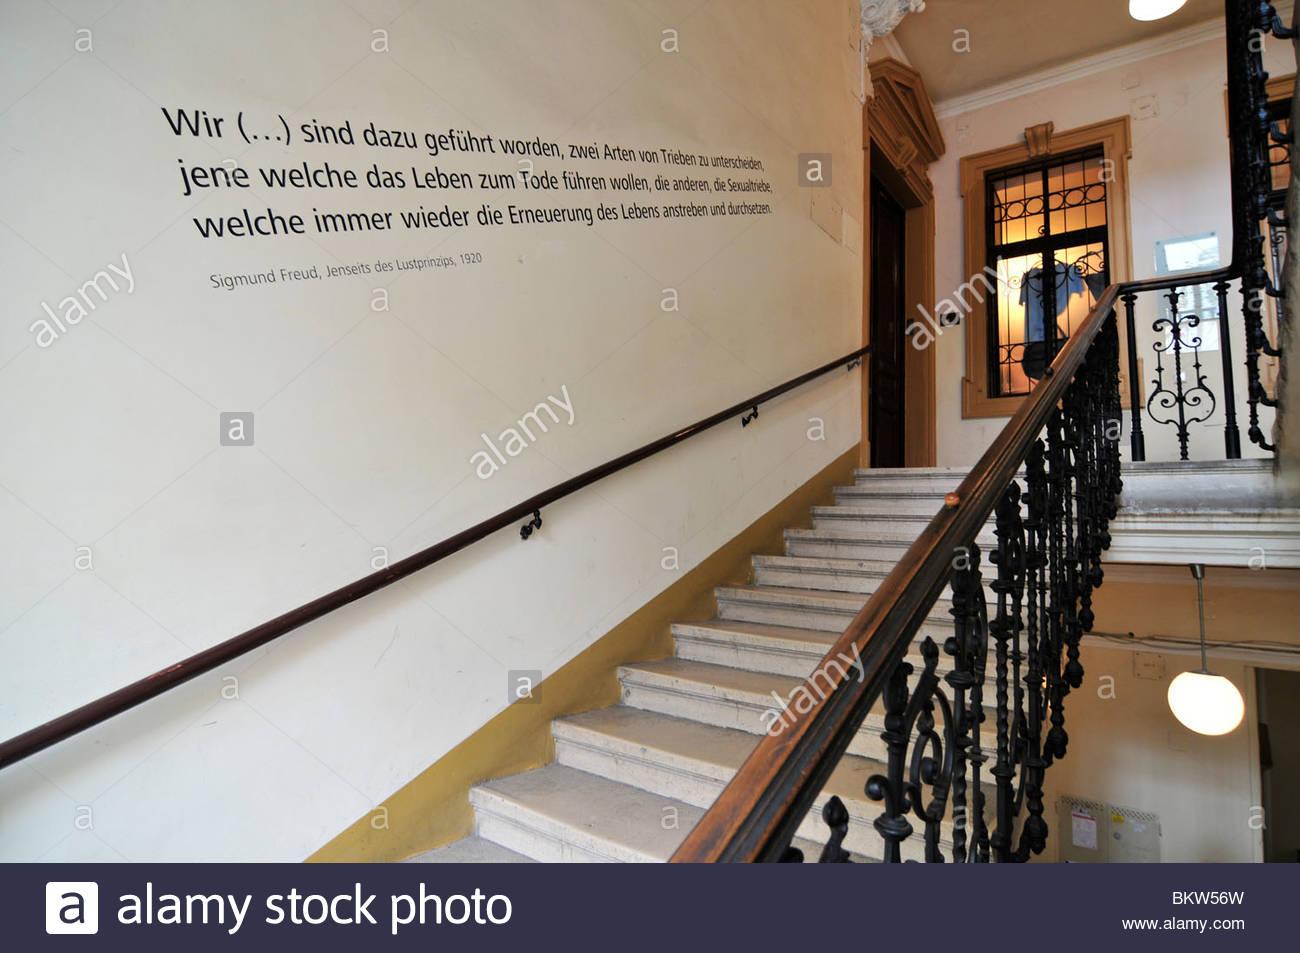 sigmund freud museum,wien,austria - Stock Image